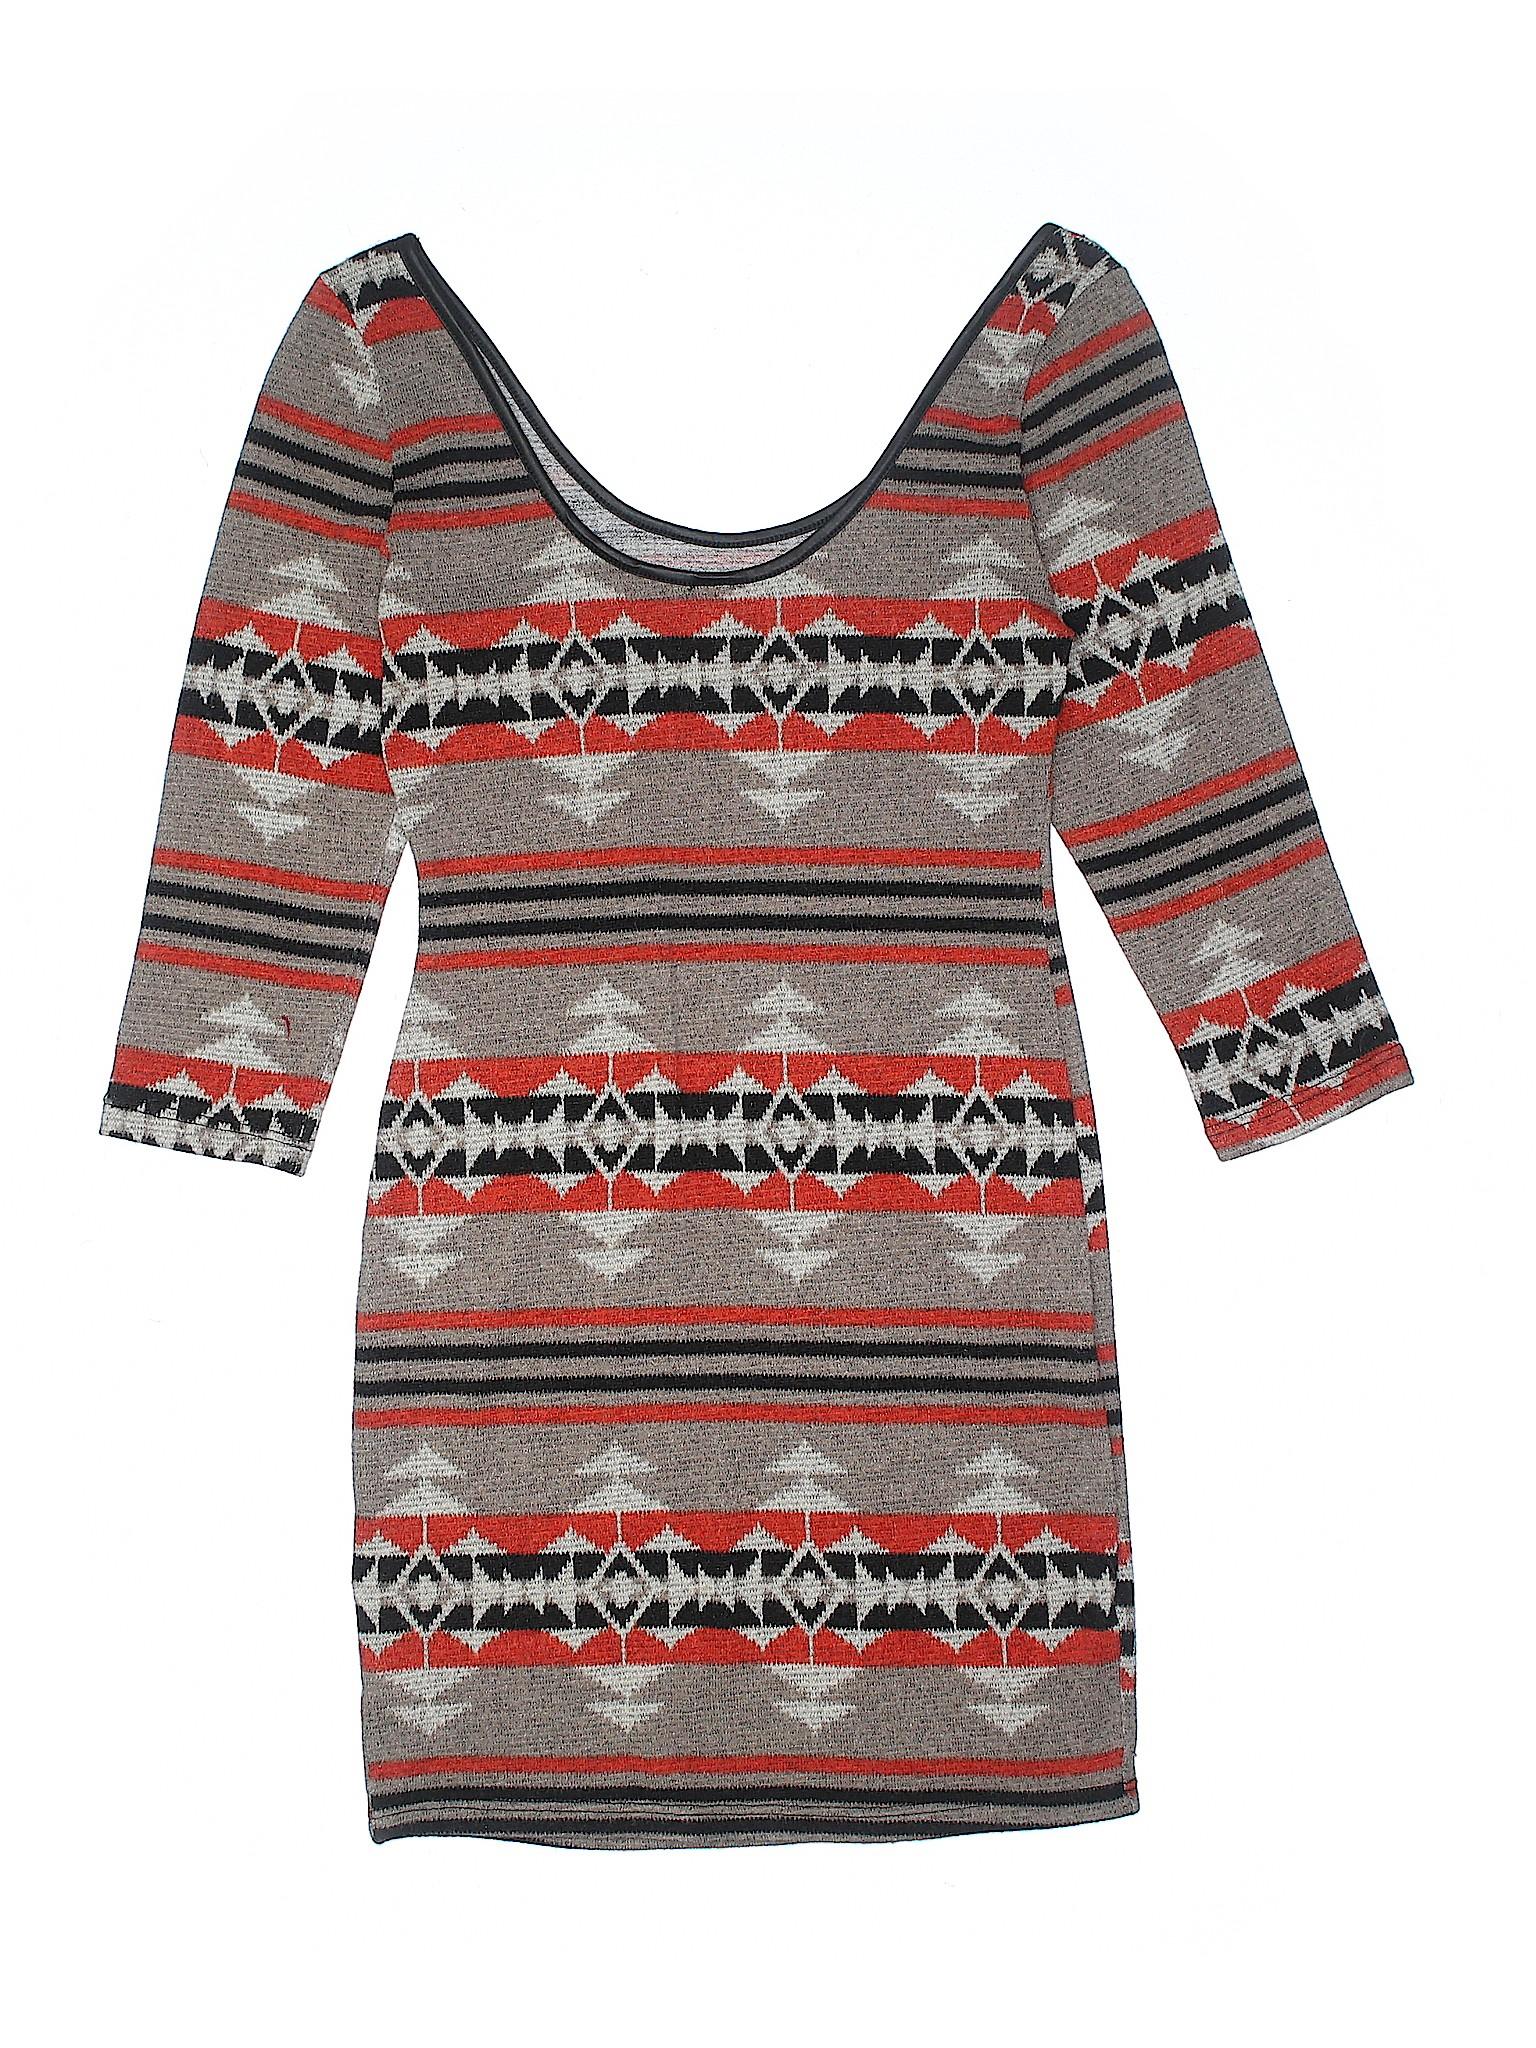 Trac Dress Selling Selling Casual Casual Trac Selling Dress Trac td4wvzqtn